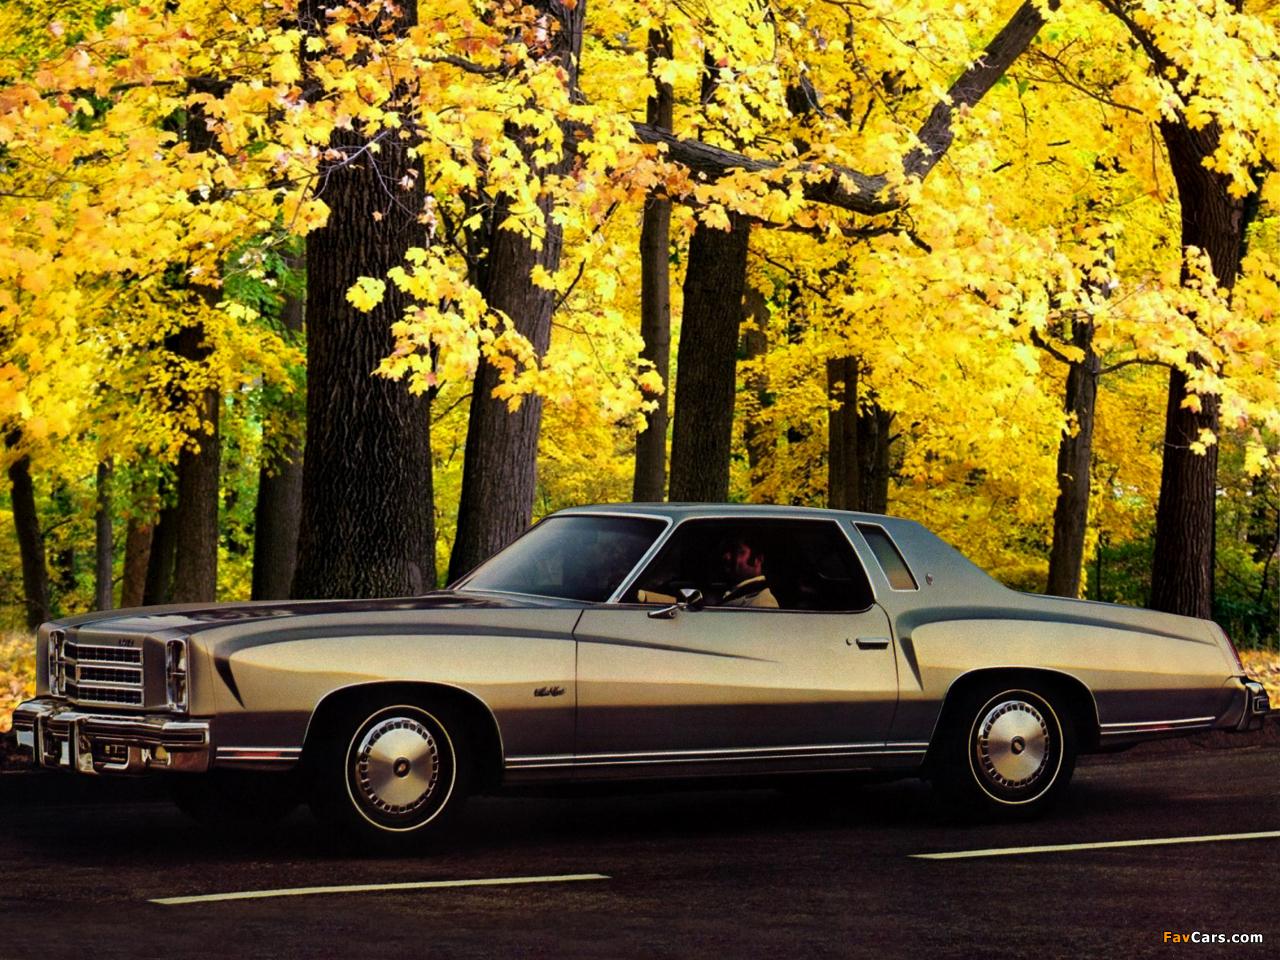 Chevrolet monte carlo coupe 1976 wallpapers 1280x960 - Monte carlo movie wallpaper ...